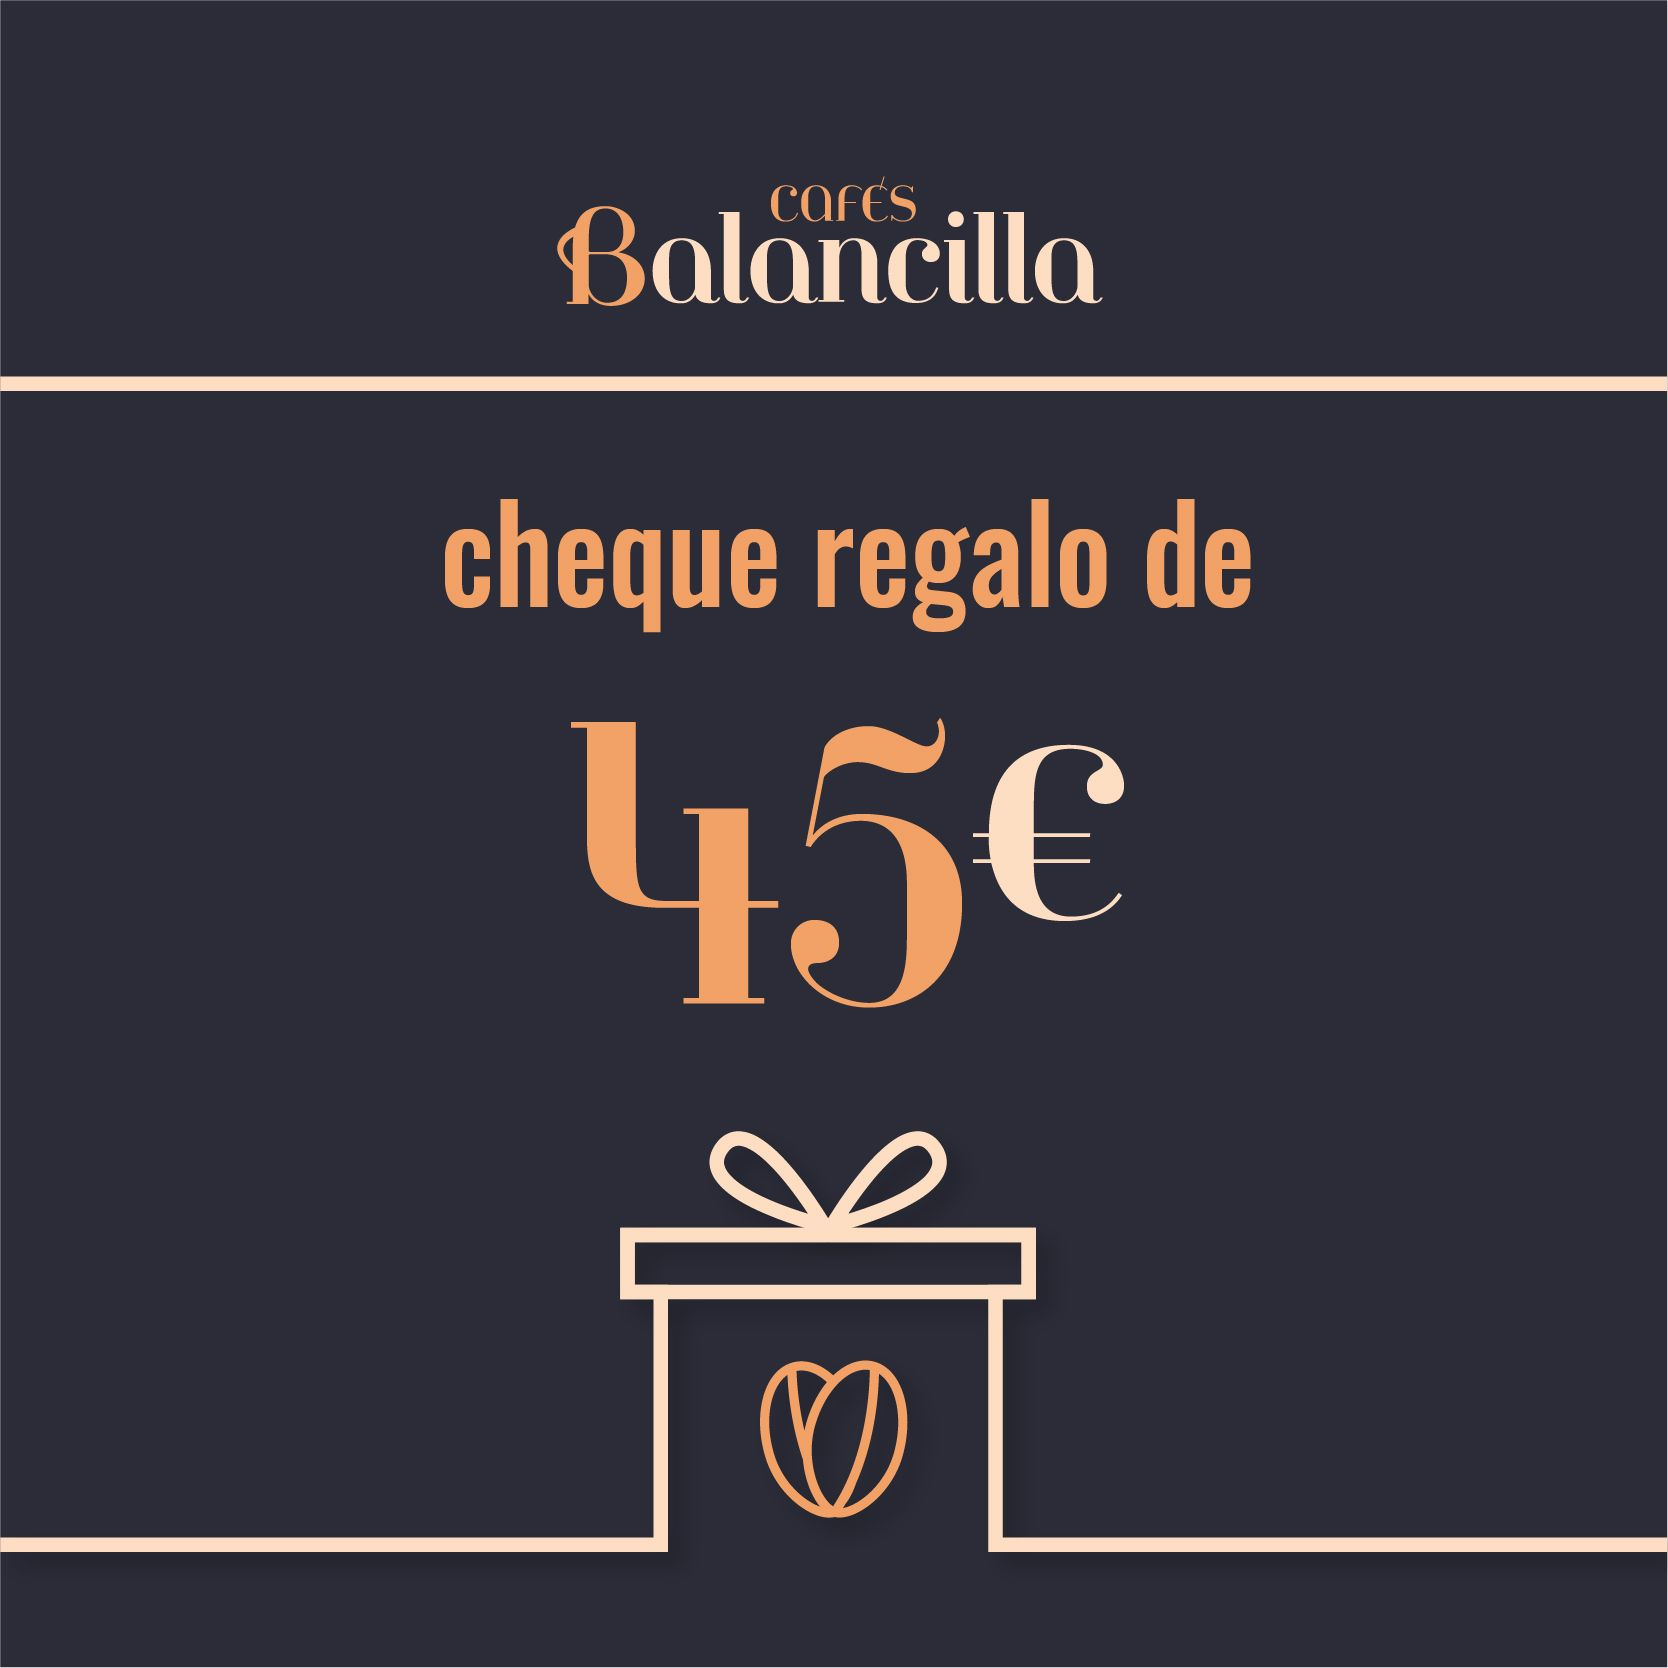 CHEQUE REGALO-Cafés Balancilla